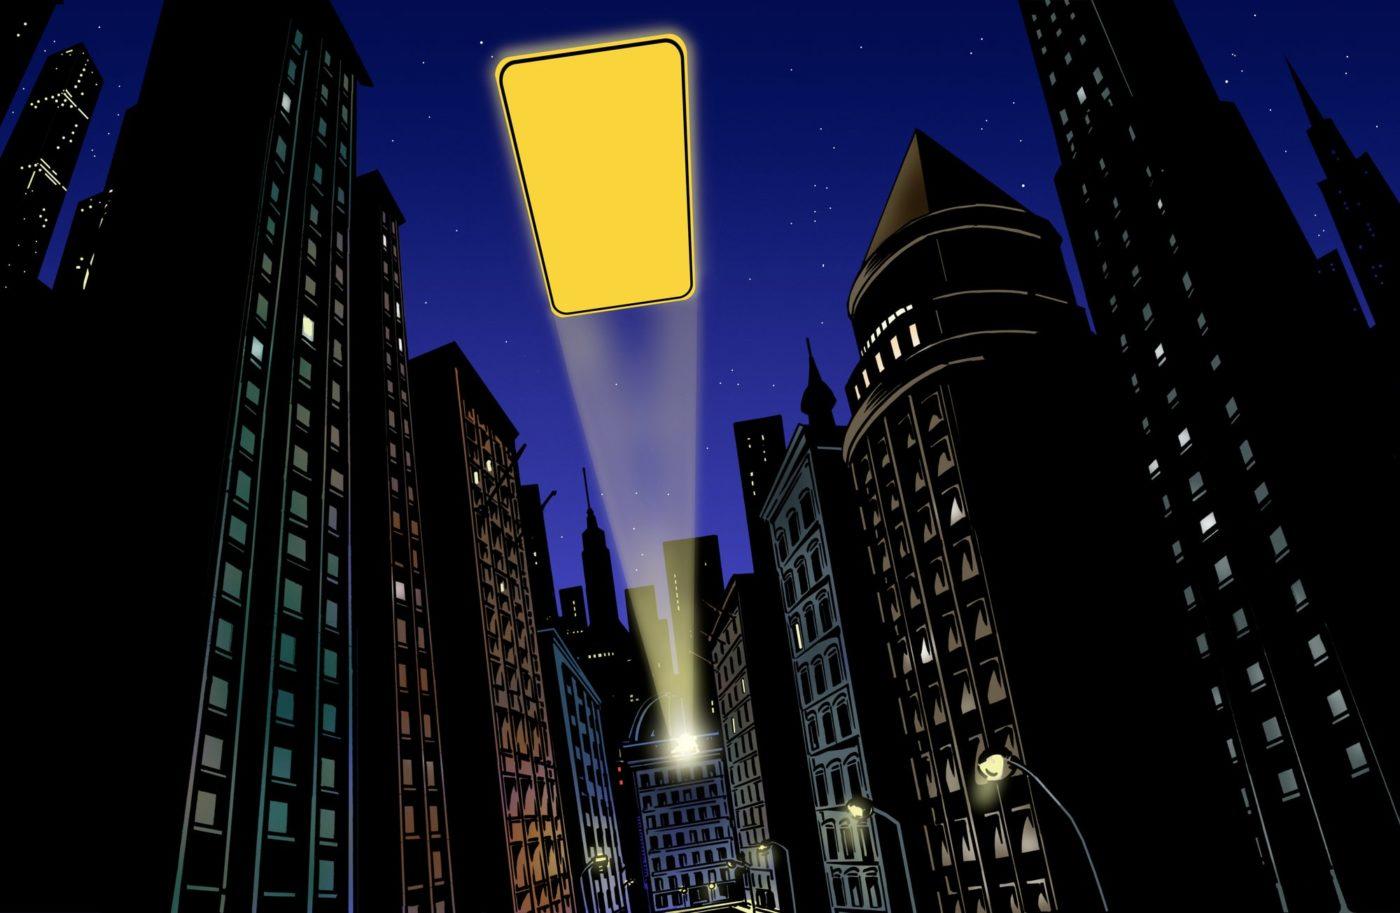 Знак Бэтмэна